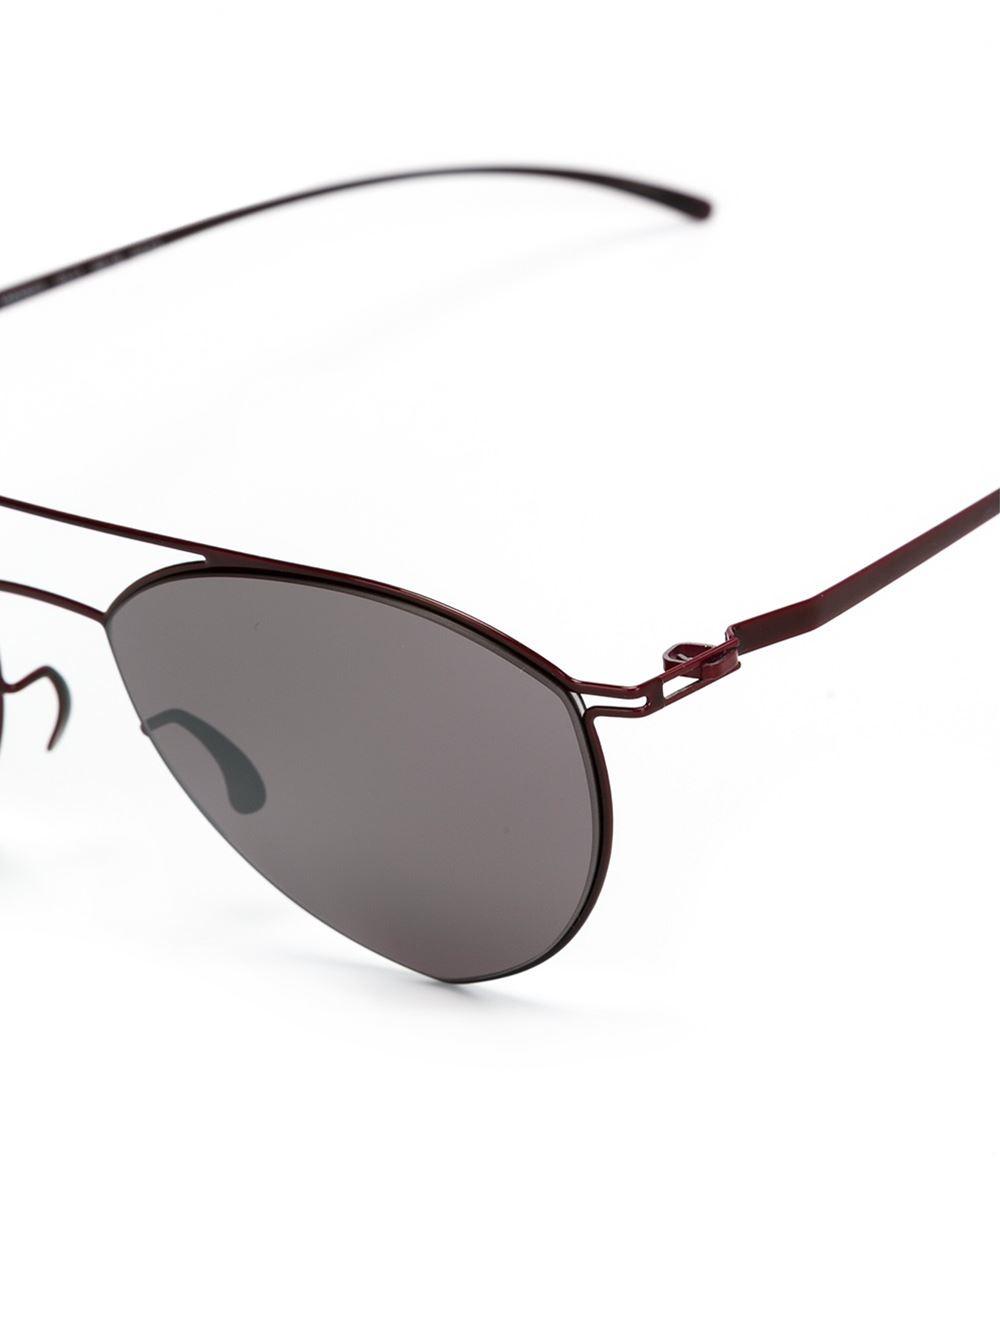 Mykita maison martin margiela x mmesse010 sunglasses in for Martin margiela glasses